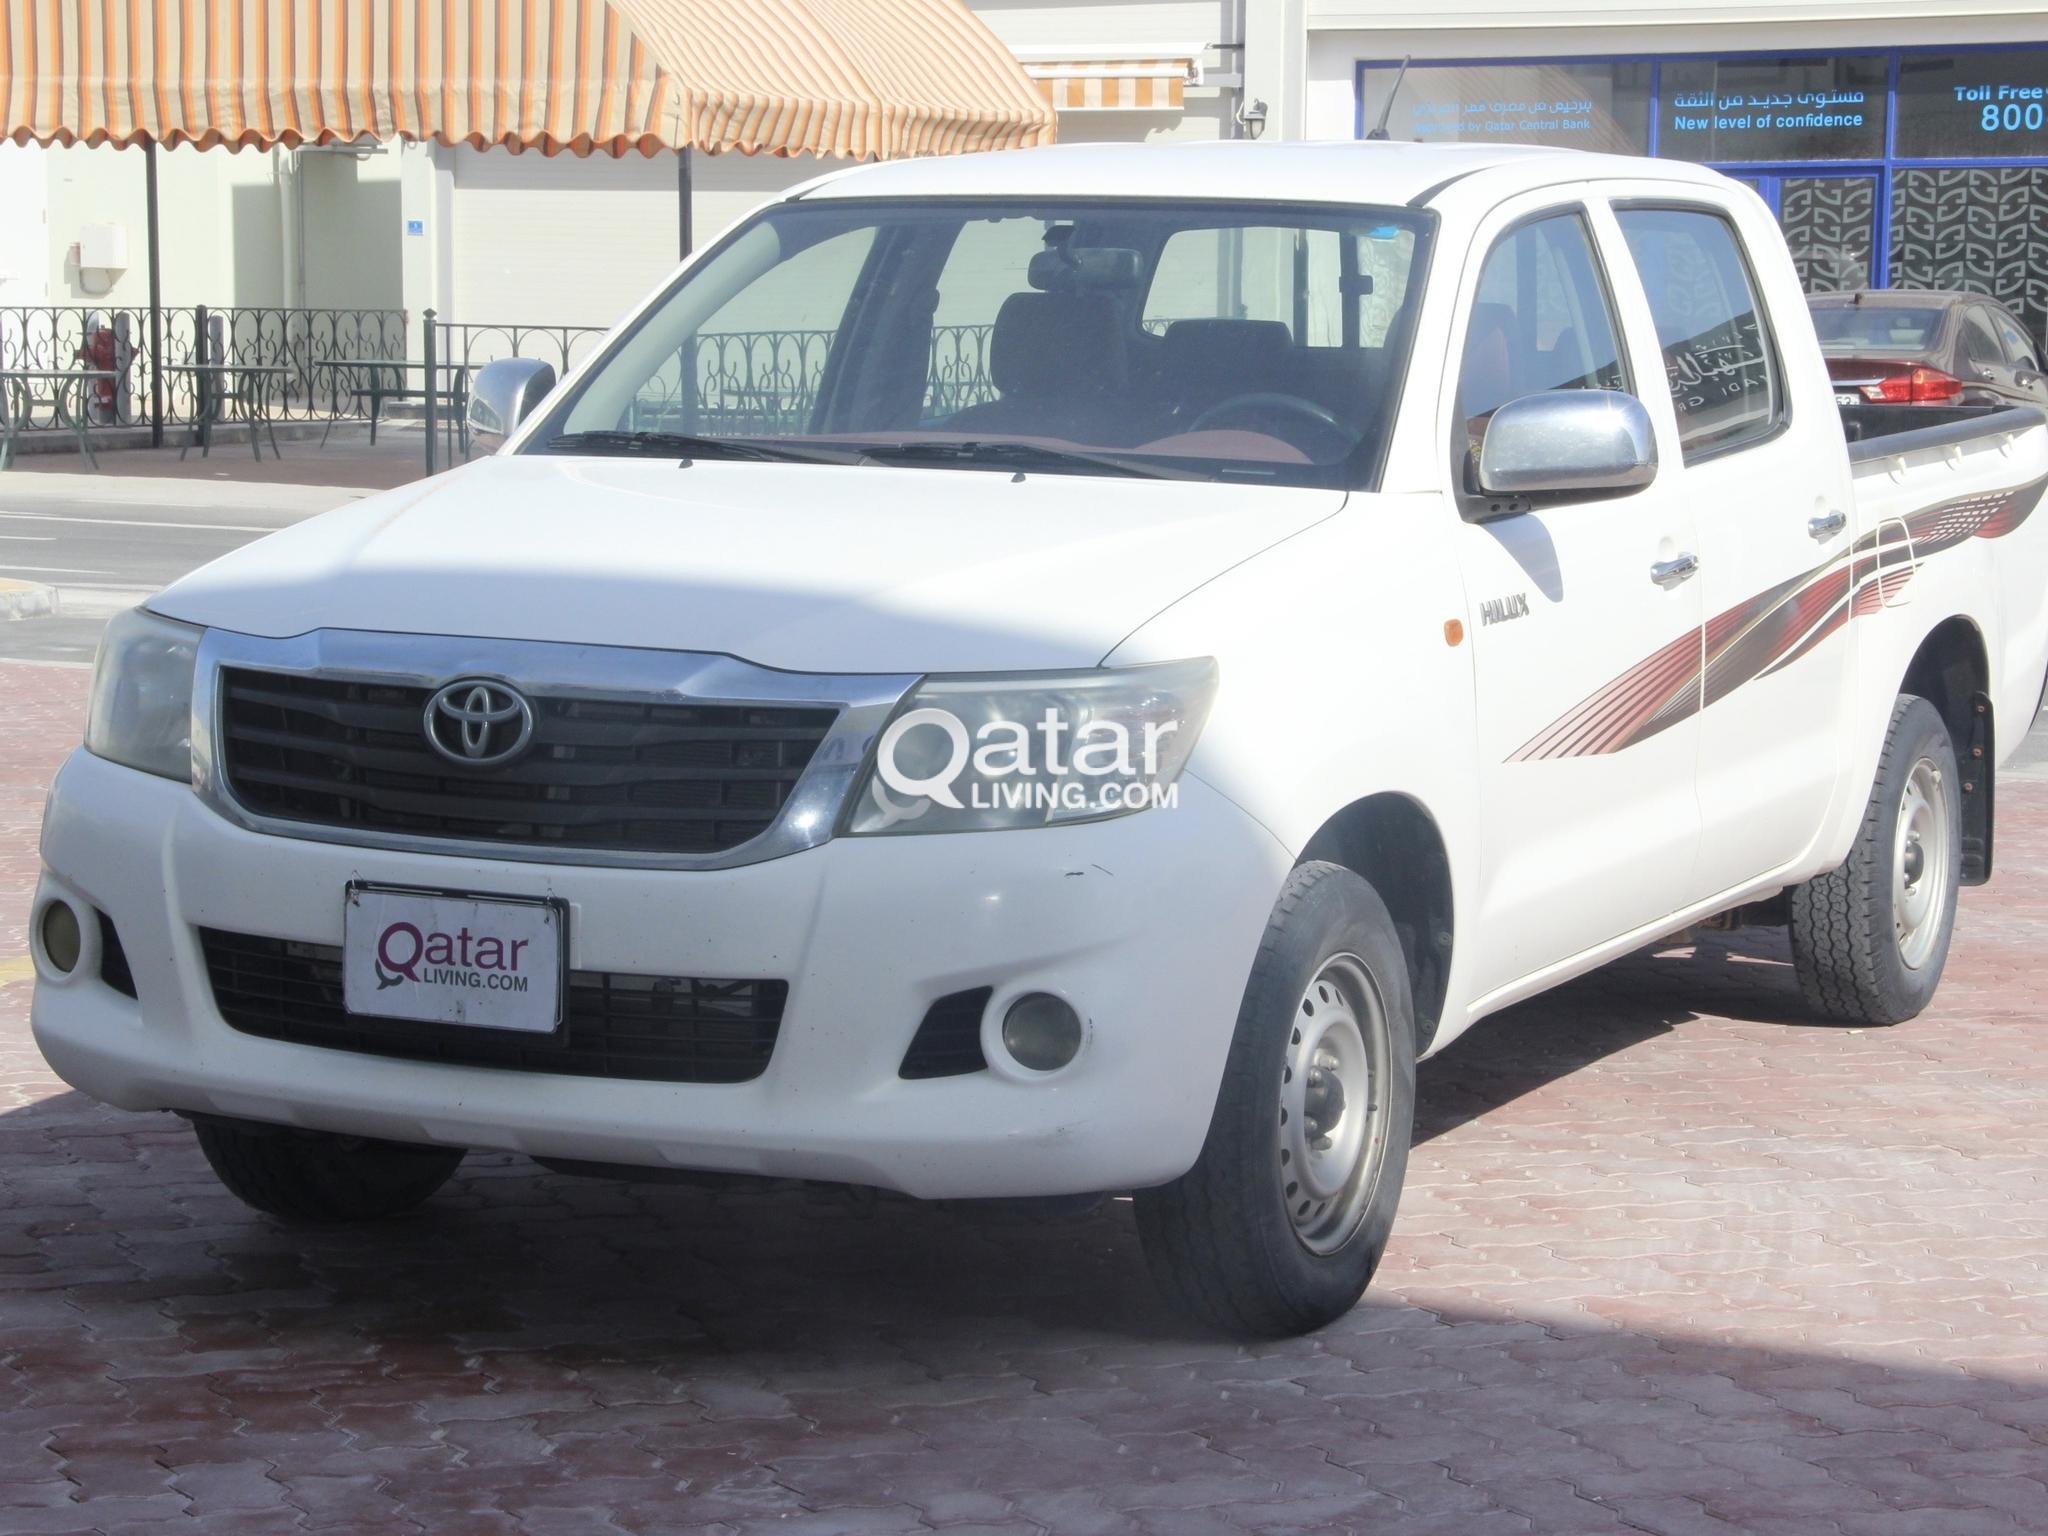 Toyota Hilux Diesel >> Toyota Hilux Diesel 2012 Qatar Living